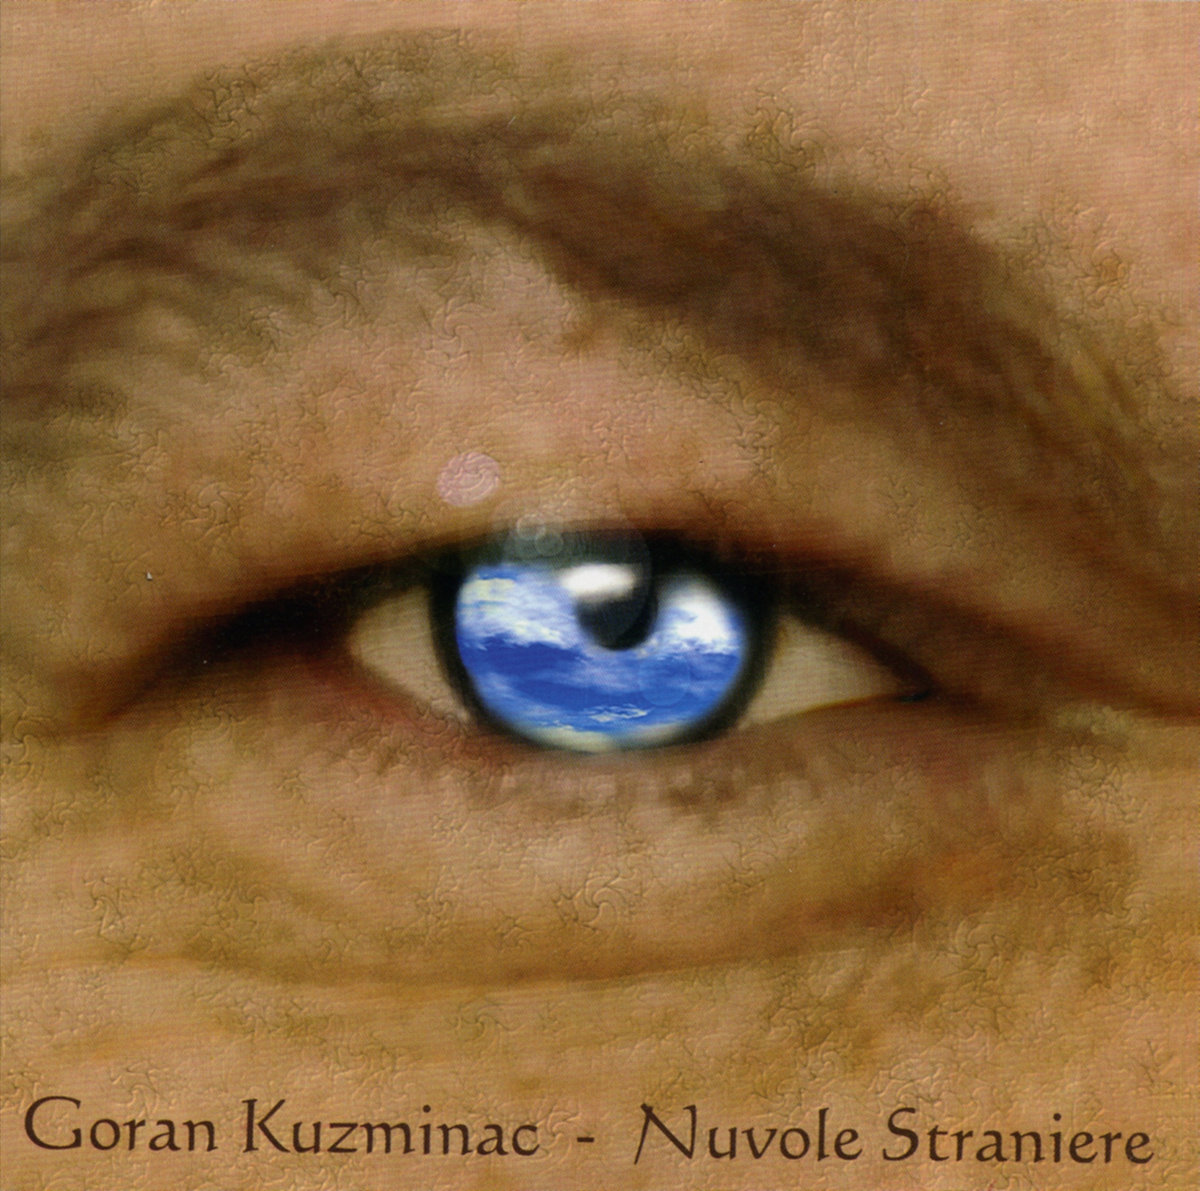 Goran Kusminac - Nuvole straniere - Cover